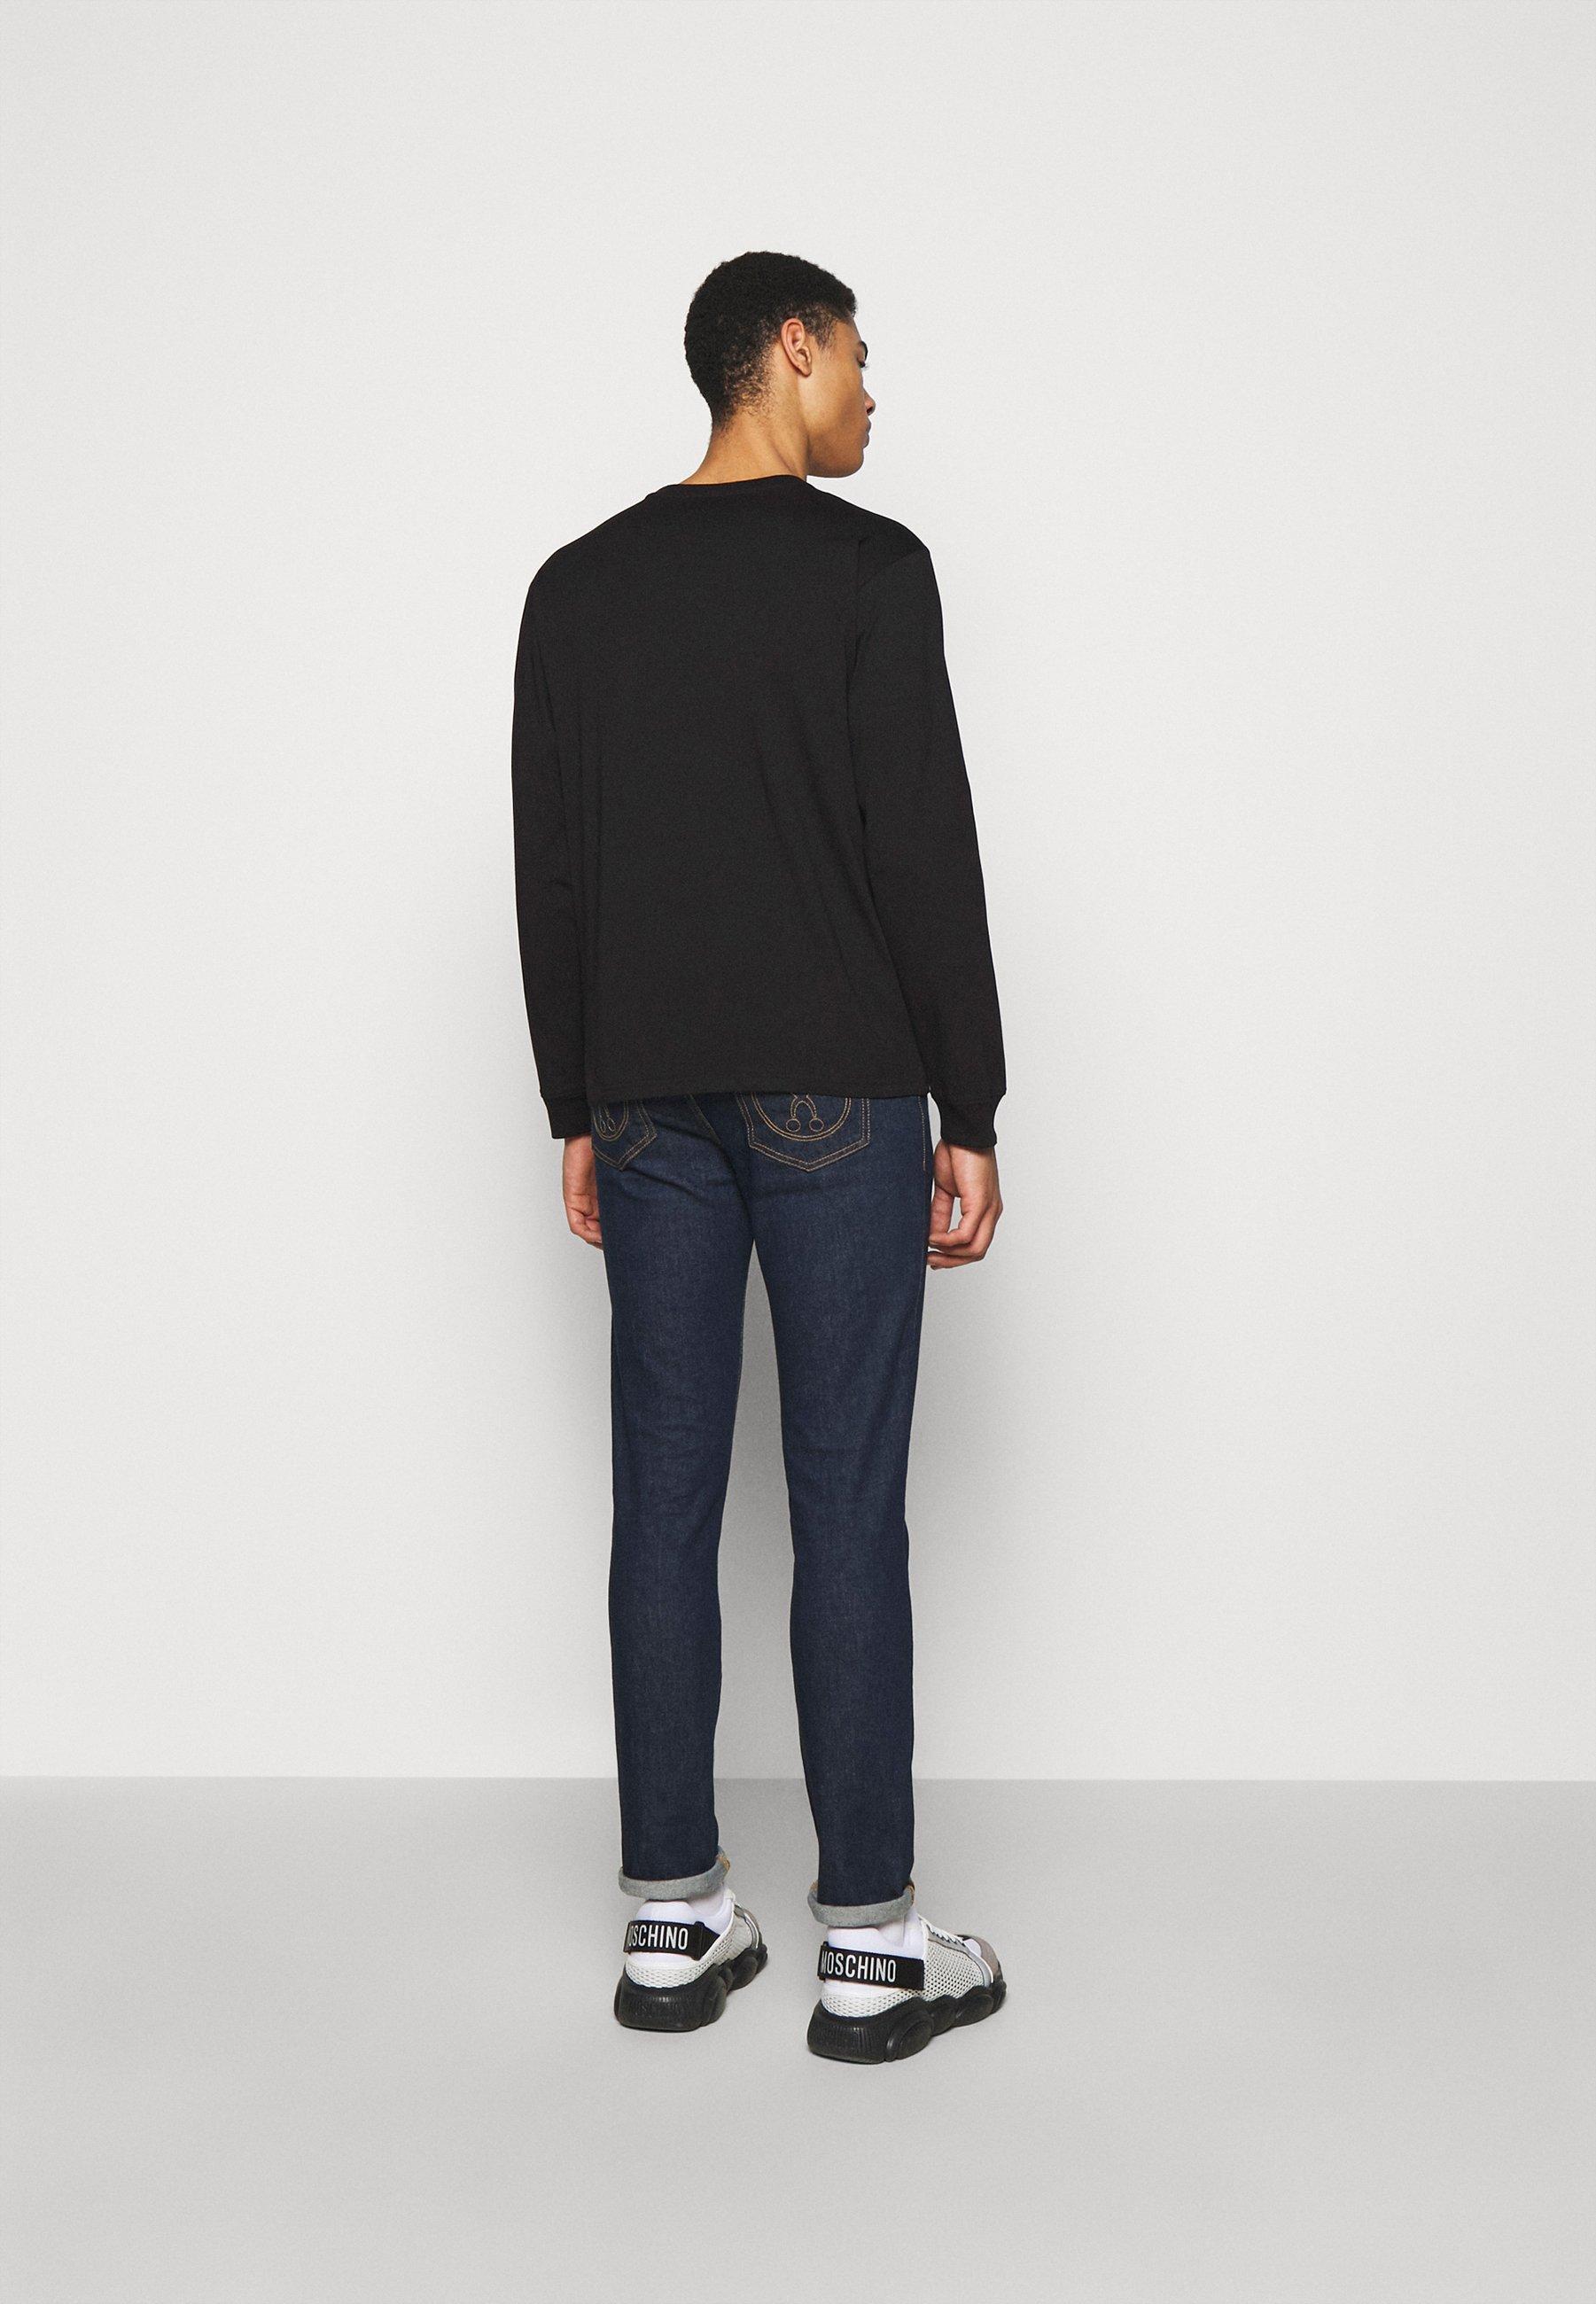 Homme UPPER BODY GARMENT - T-shirt à manches longues